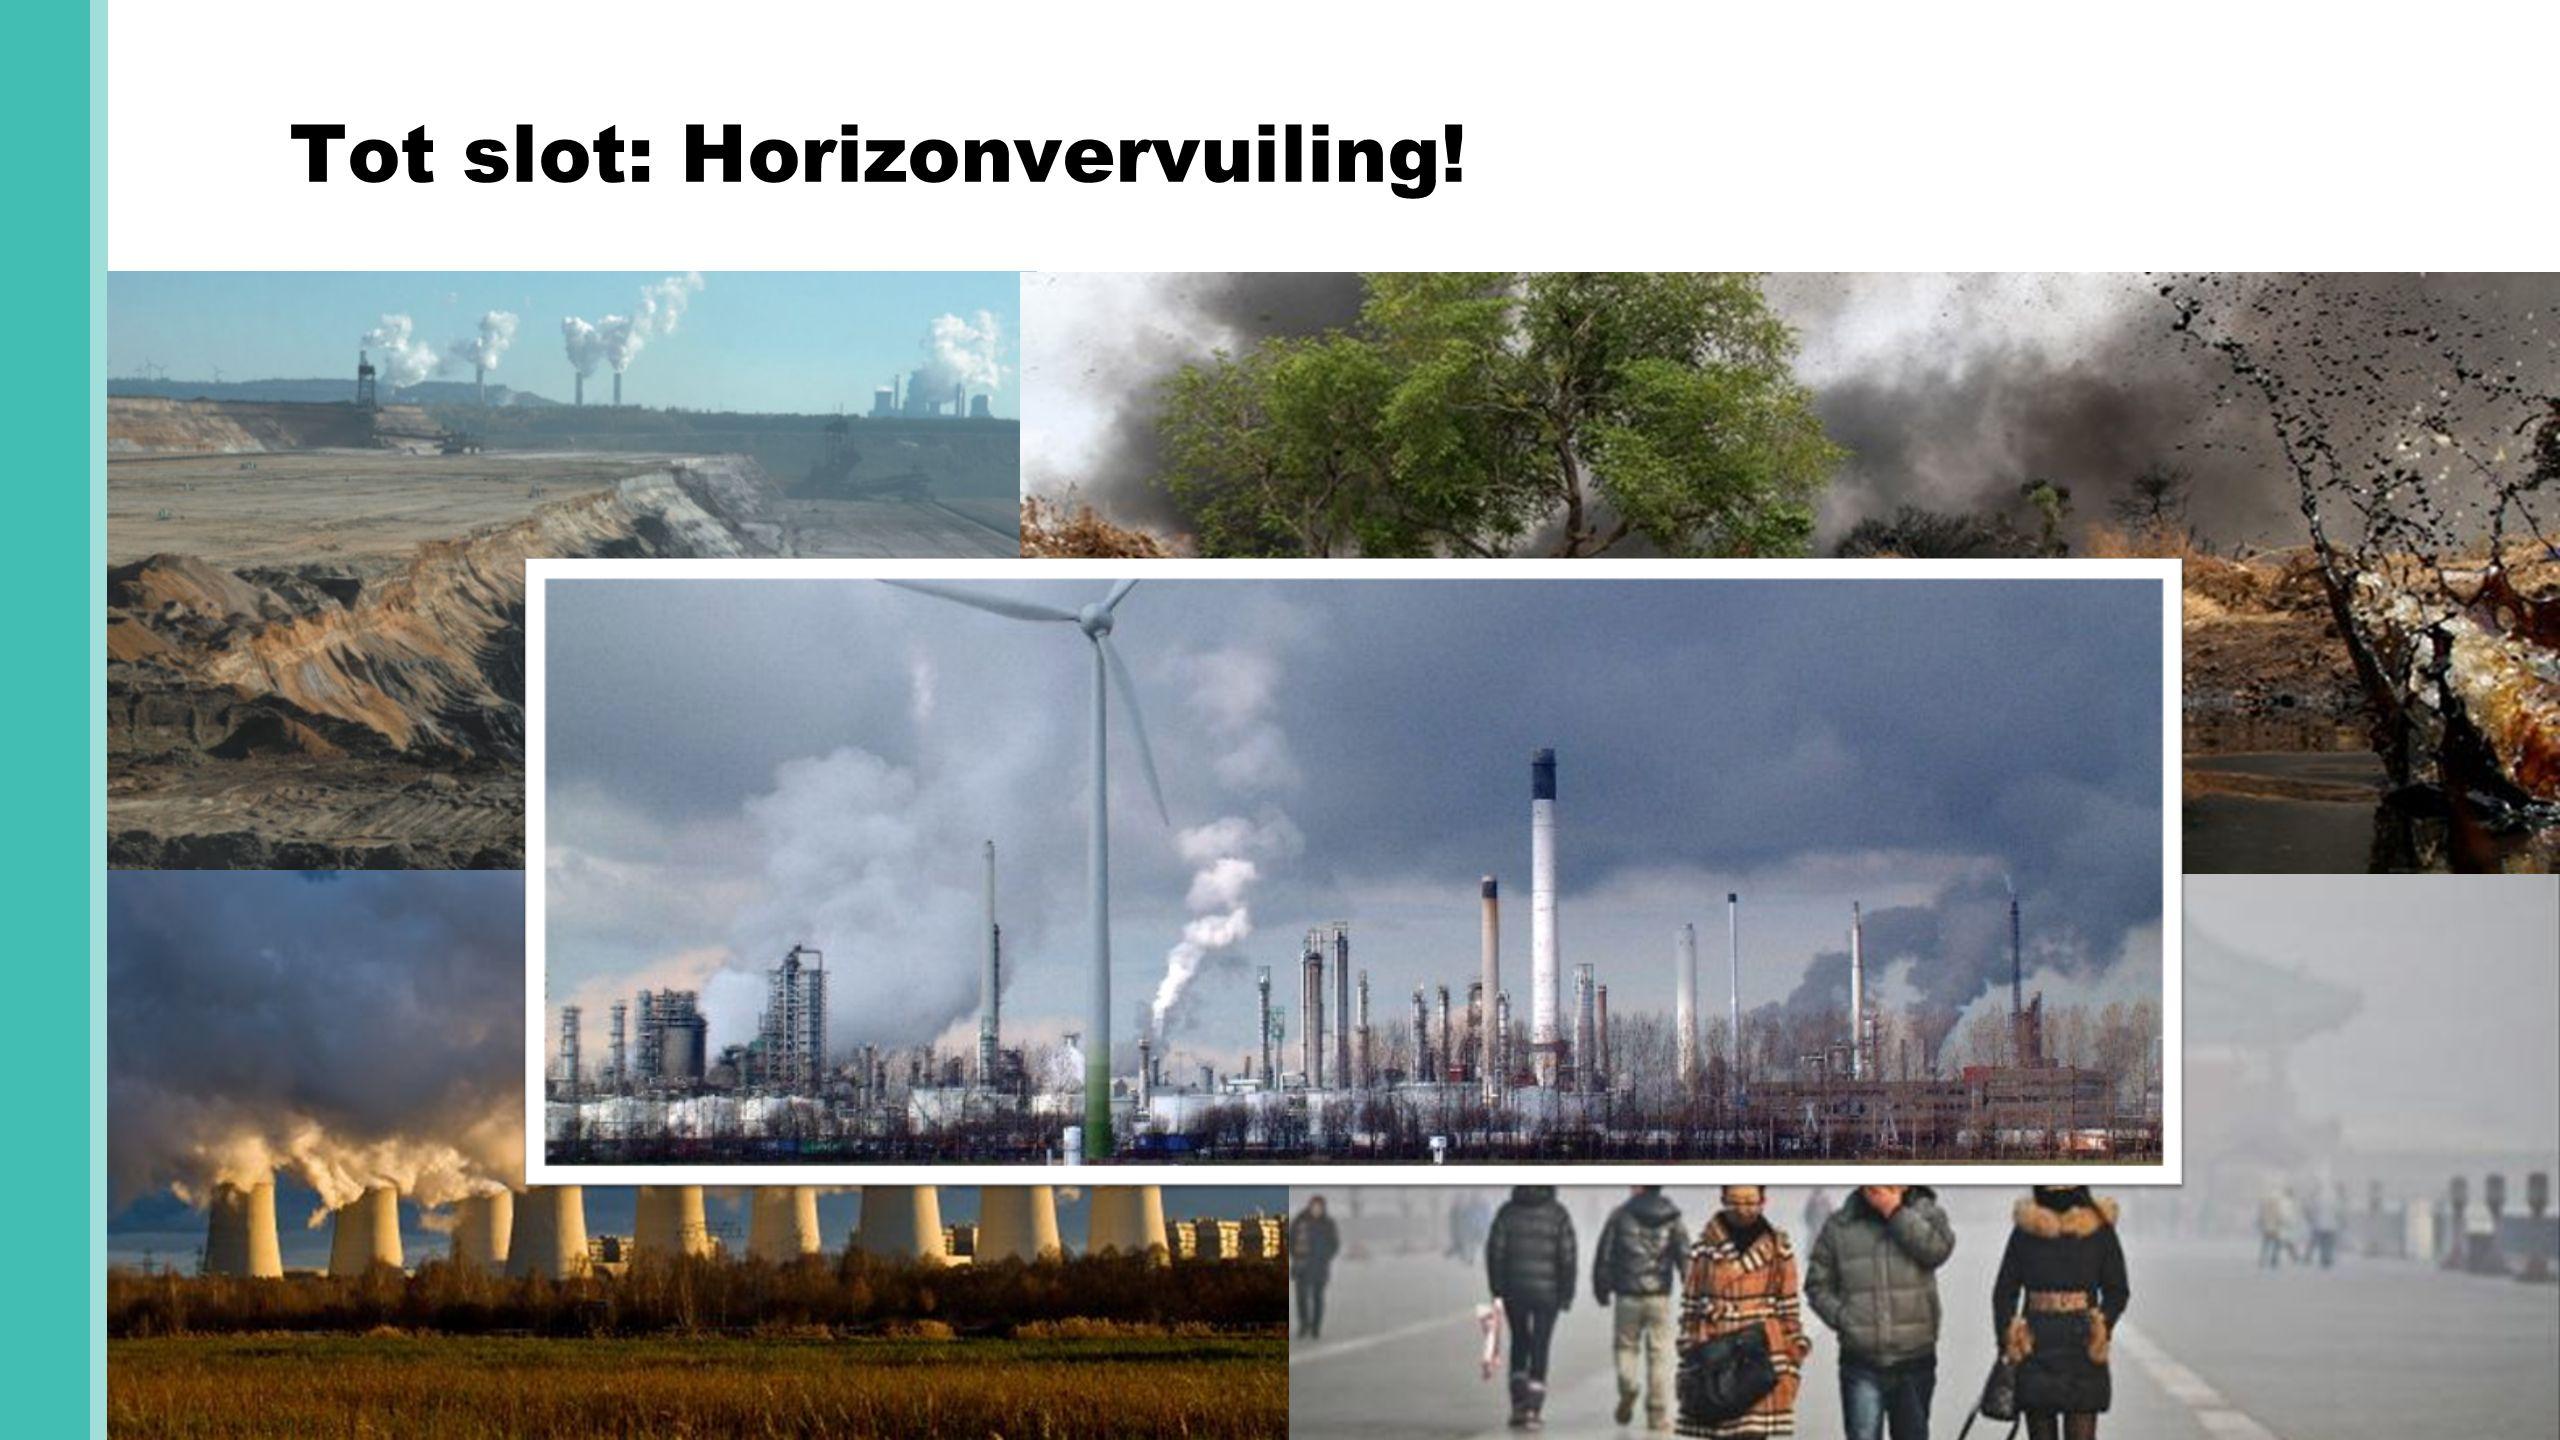 Tot slot: Horizonvervuiling! Hoe eenvoudigein vorm, hoe beter.